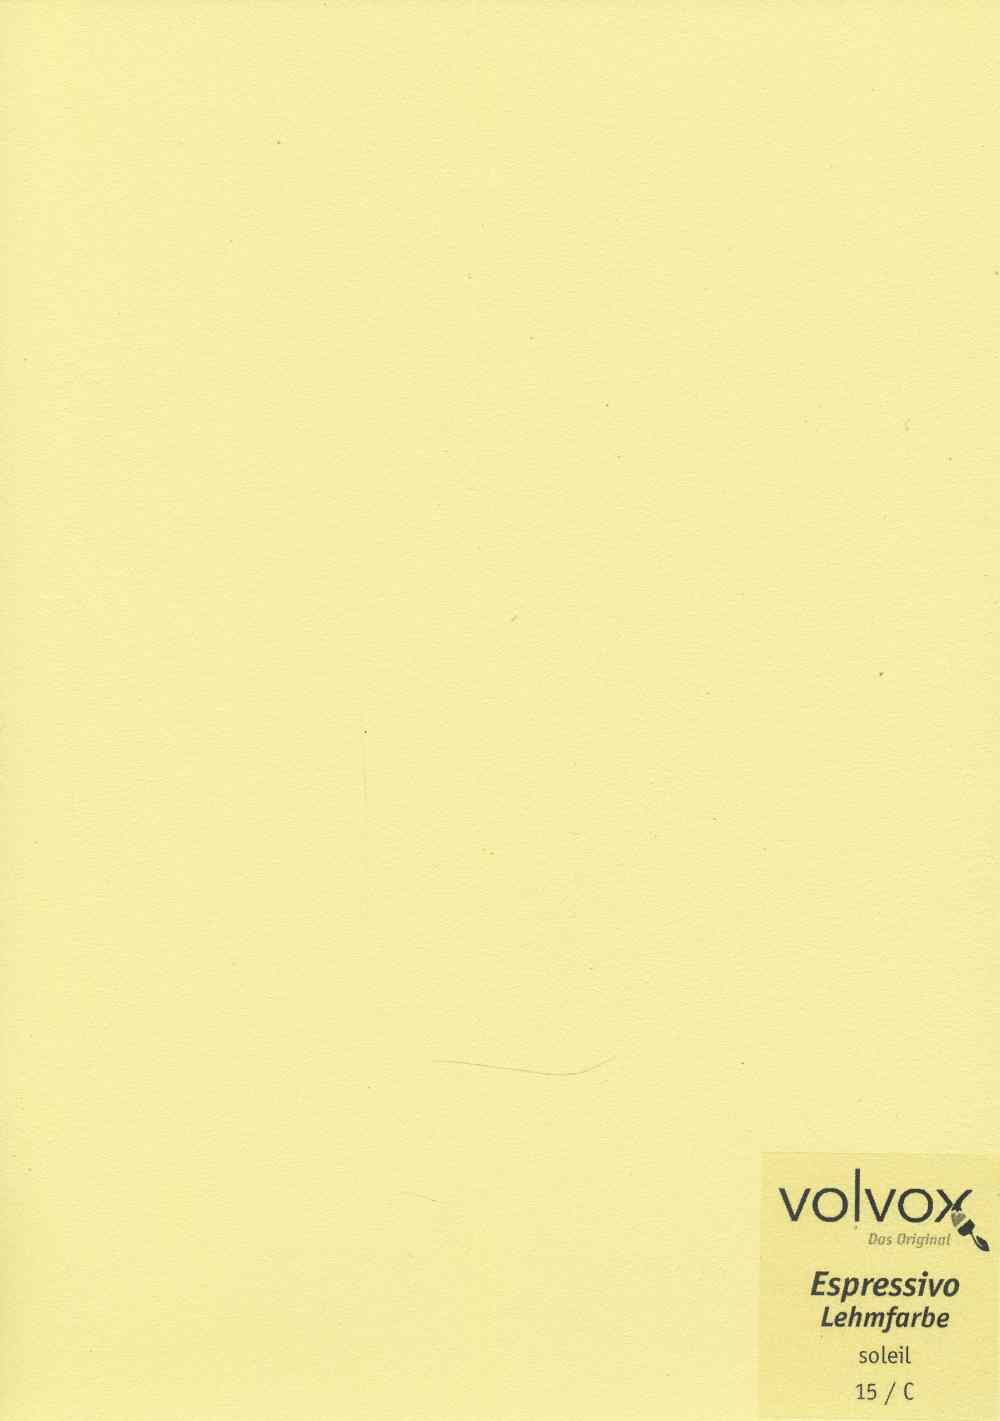 Volvox Espressivo Lehmfarbe 015 soleil